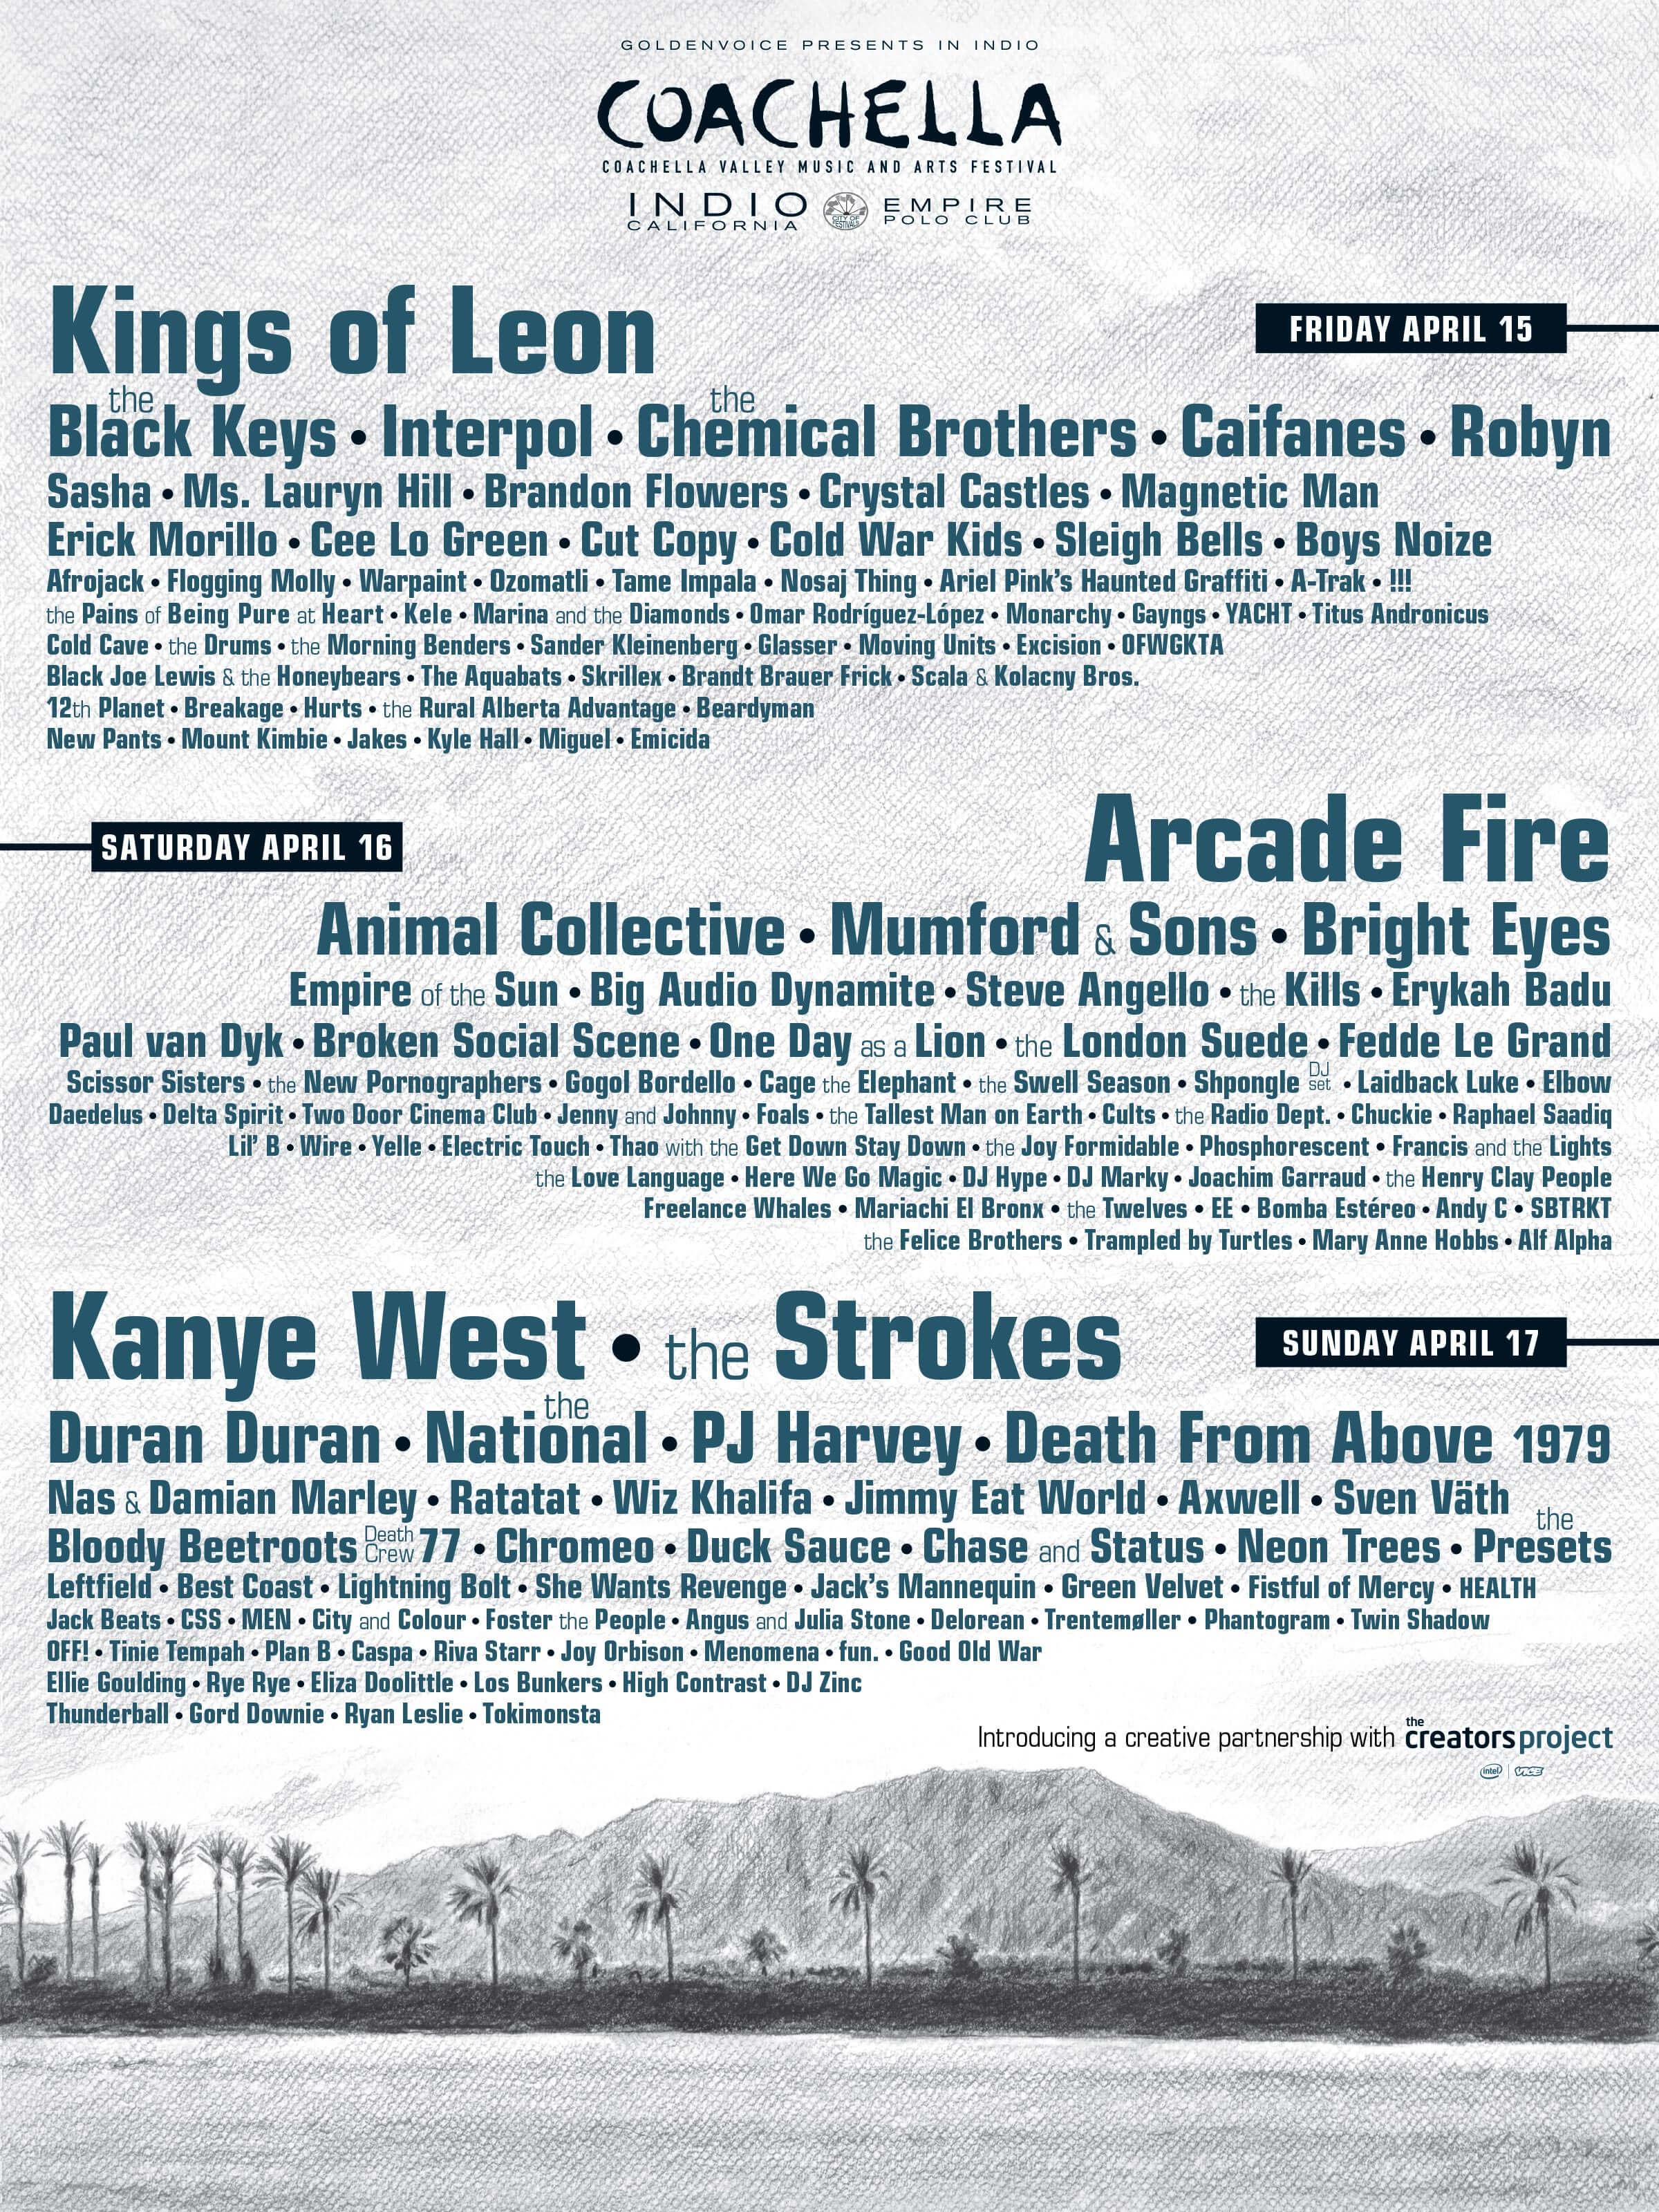 Coachella 2011 Lineup Poster